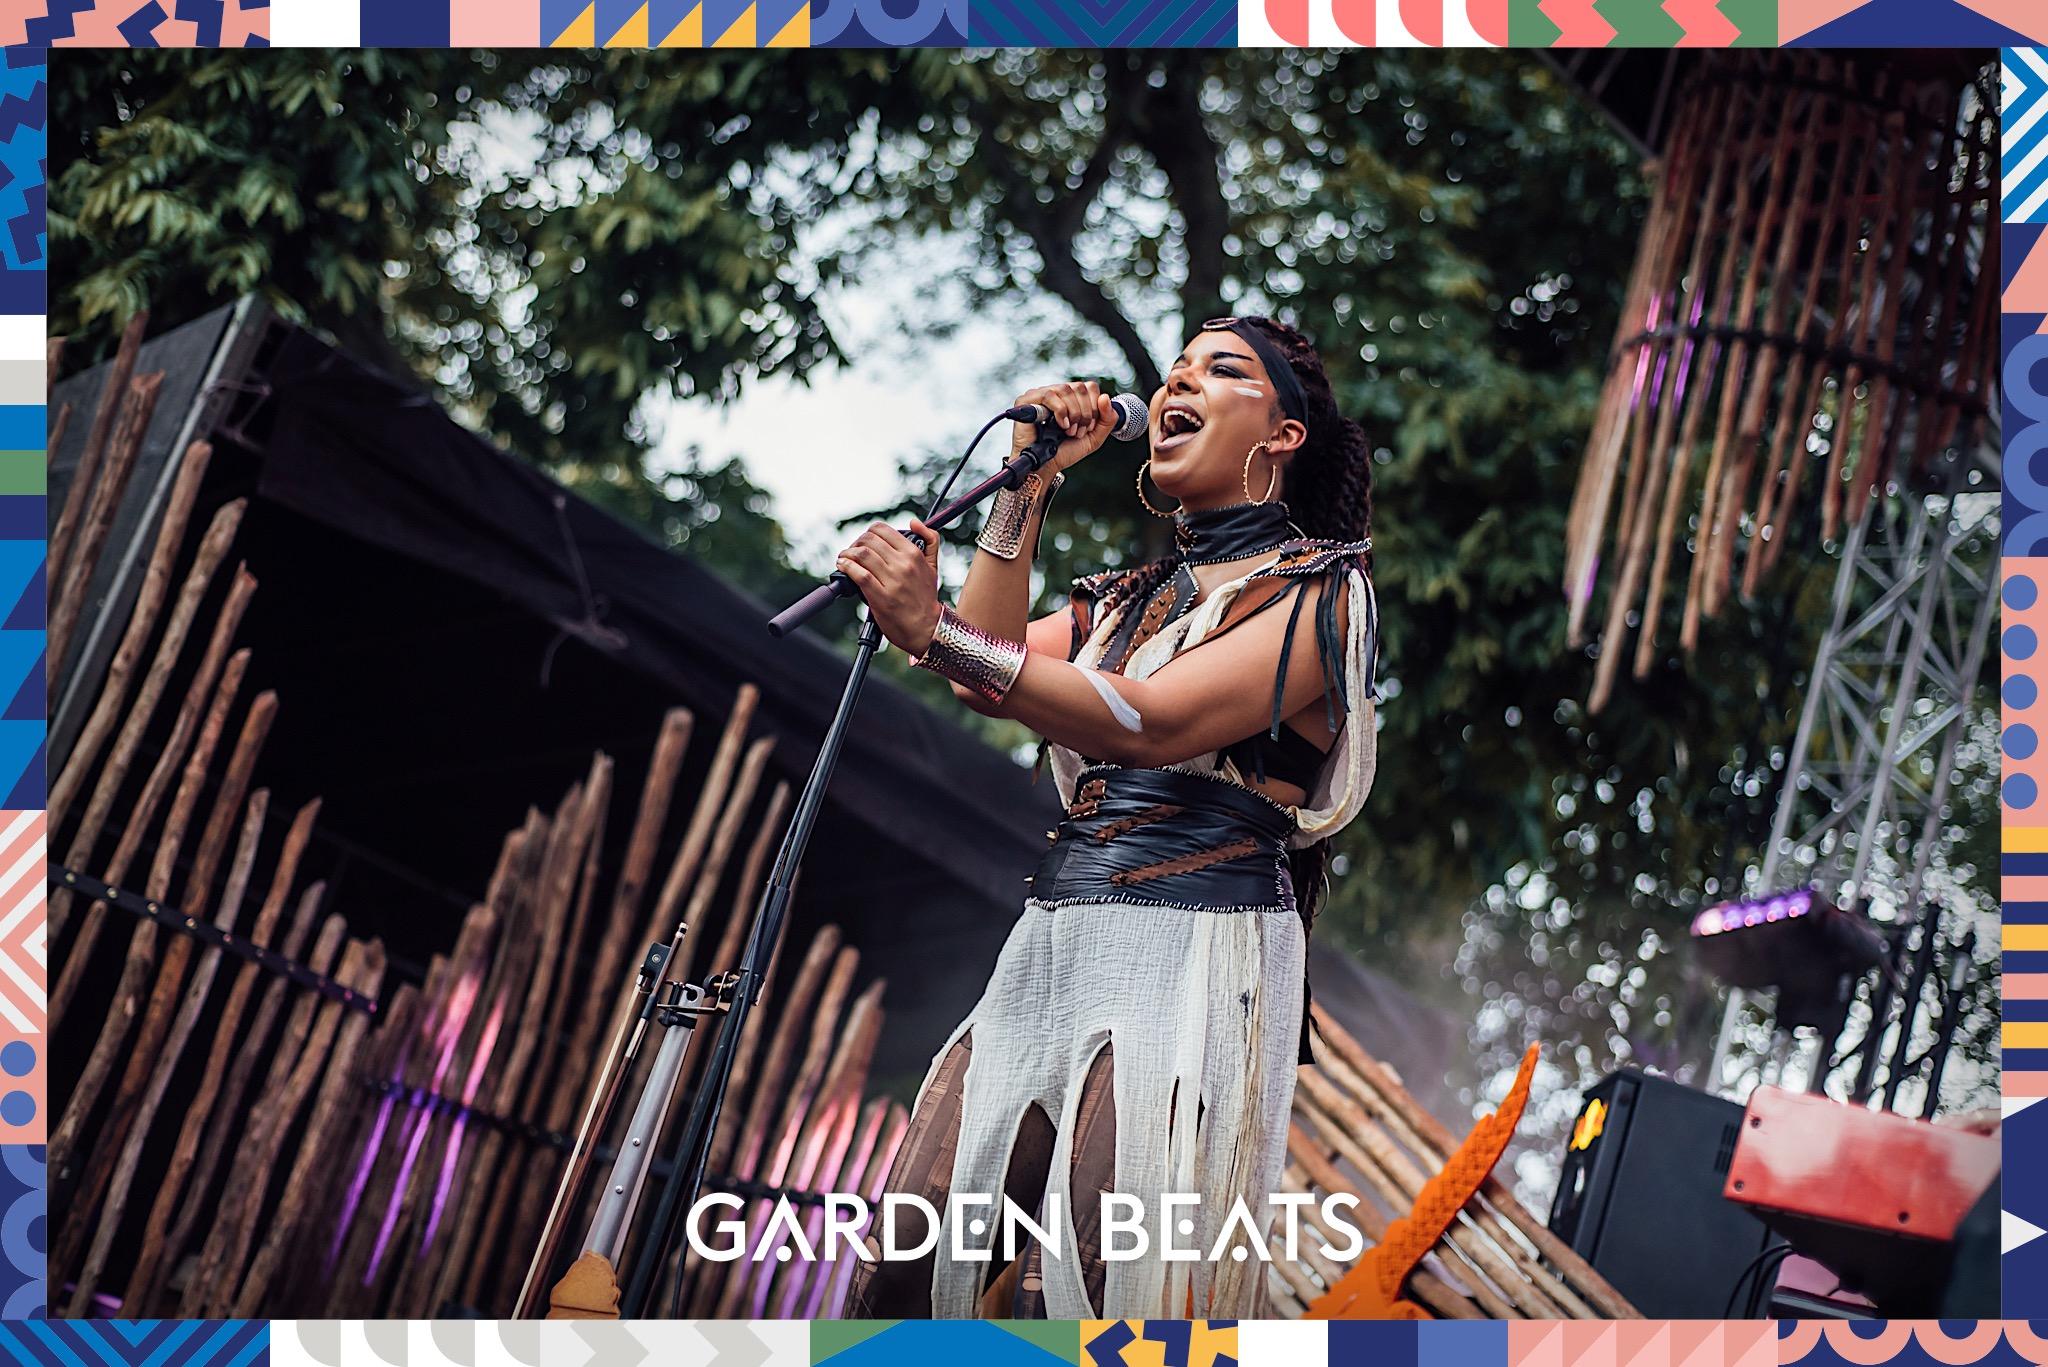 18032017_GardenBeats_Colossal652_WatermarkedGB.jpg